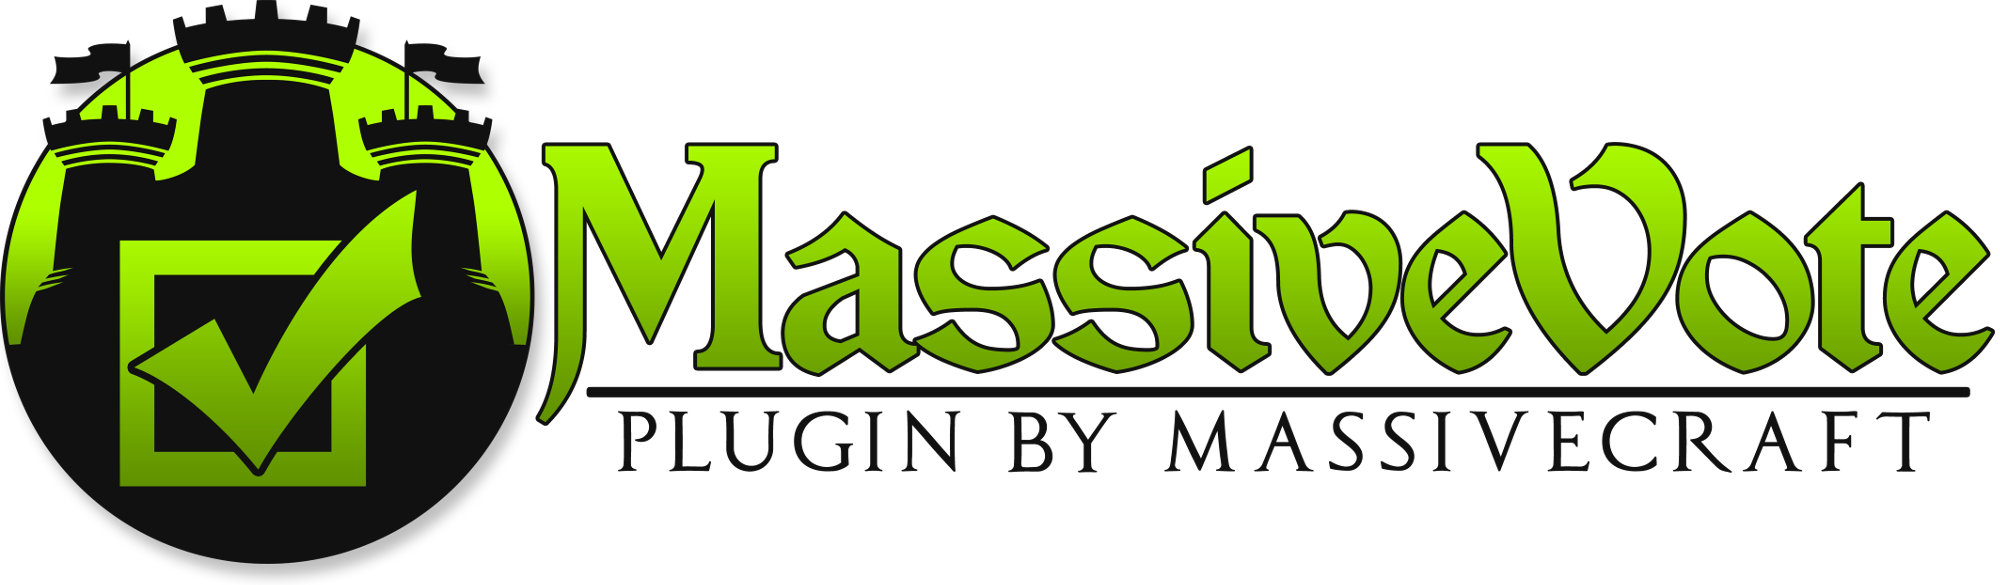 massivecraft-logotype-plugin-massivevote-2000